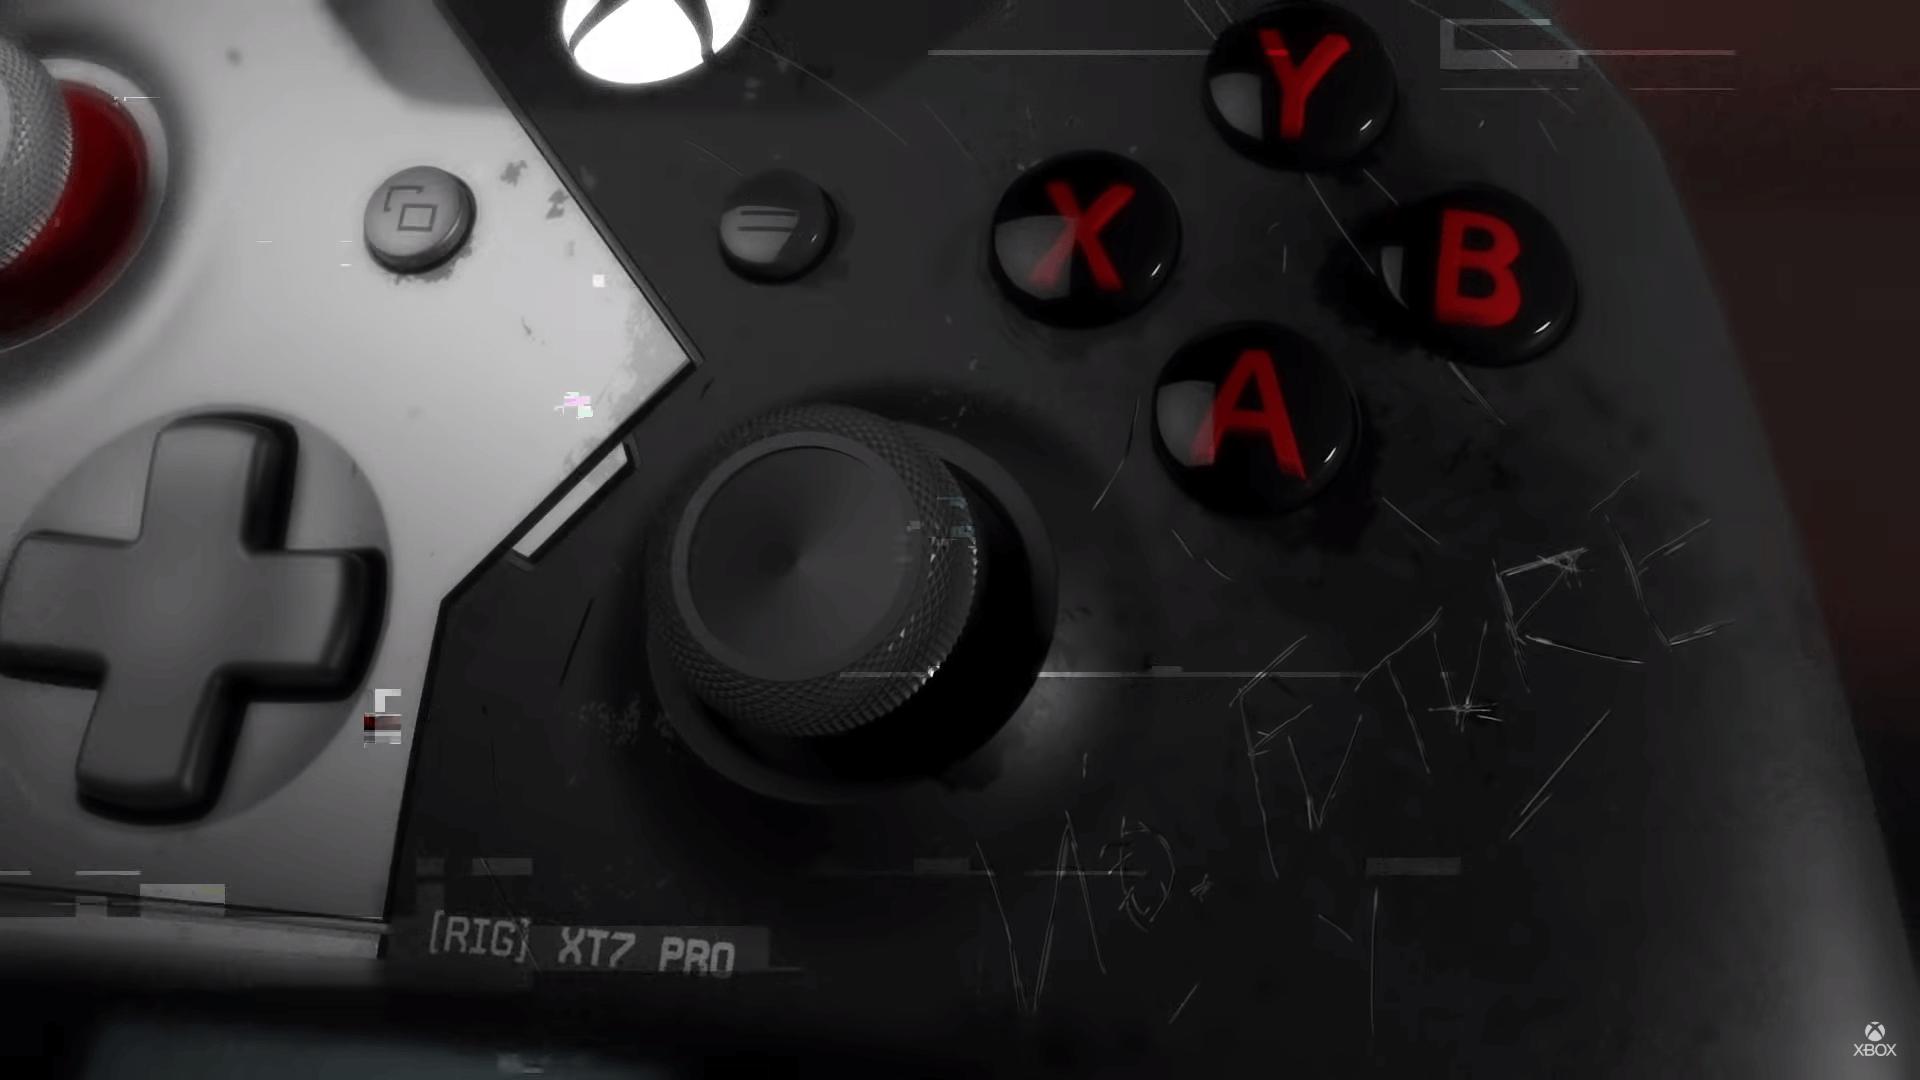 Controller Xbox One X Cyberpunk 2077 lymited edition bundle screnshot